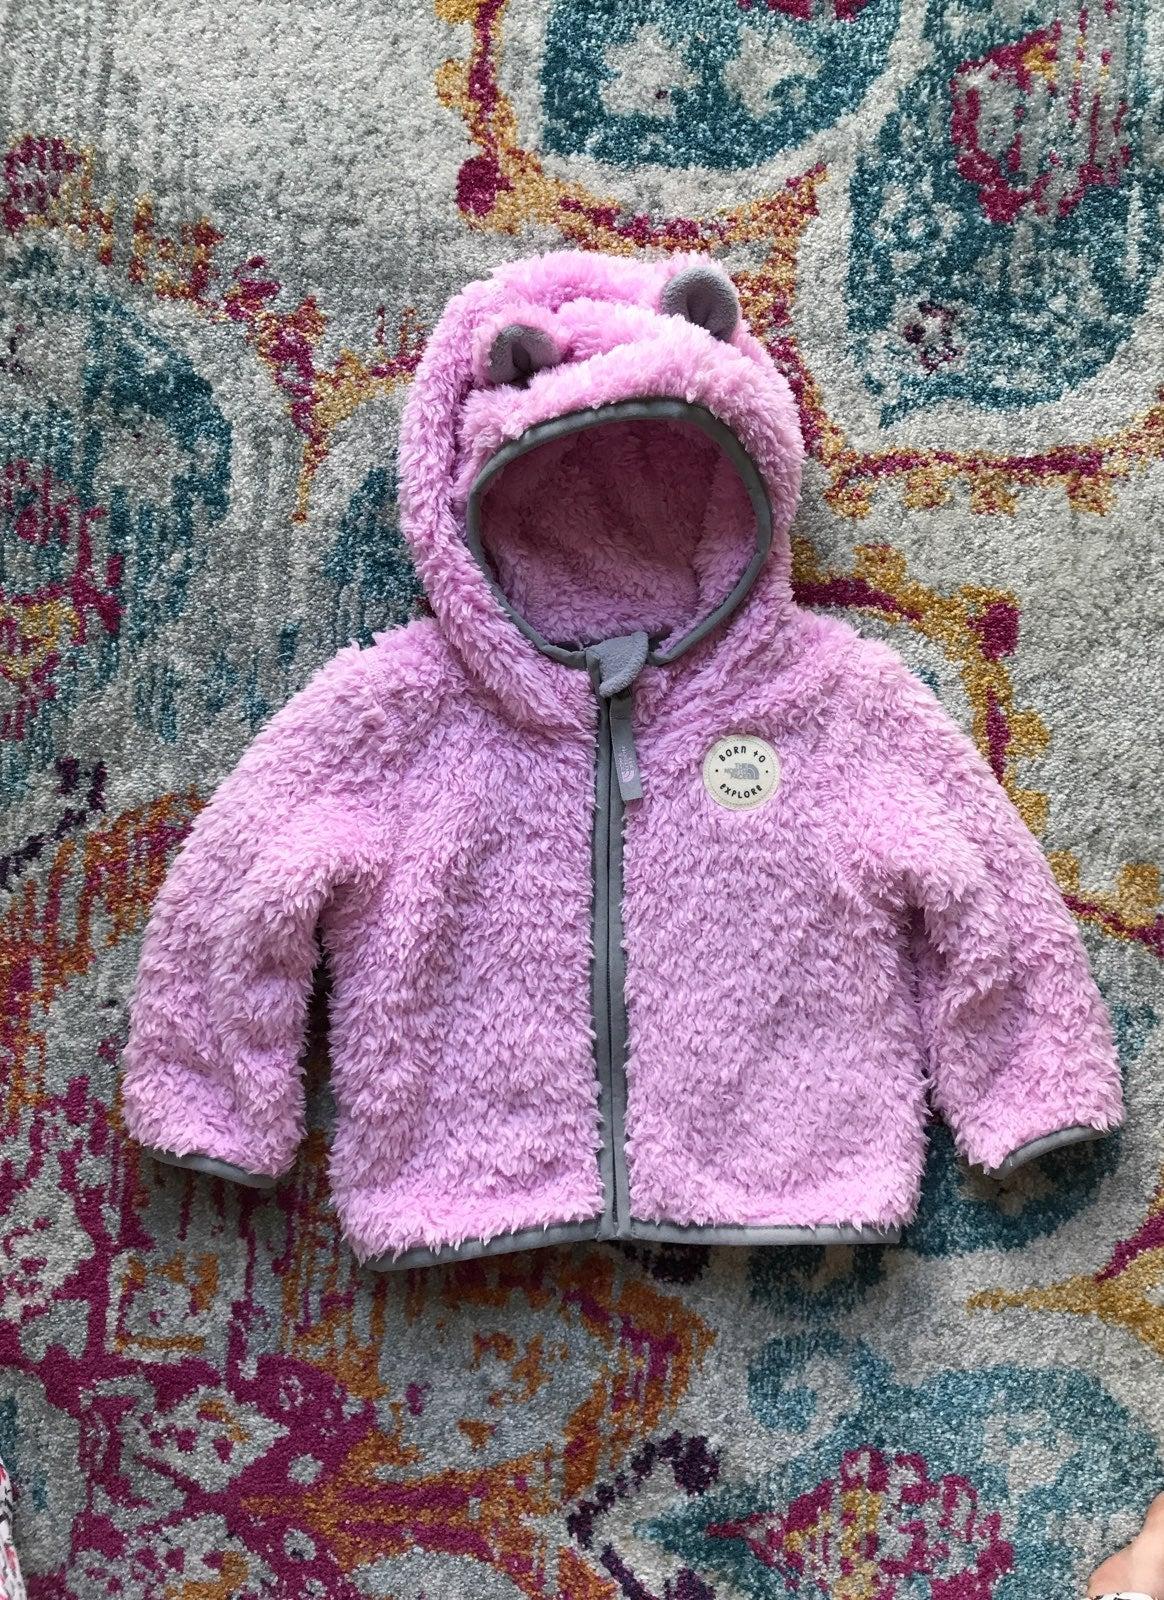 Babygirl Northface Jacket 6-12 Months